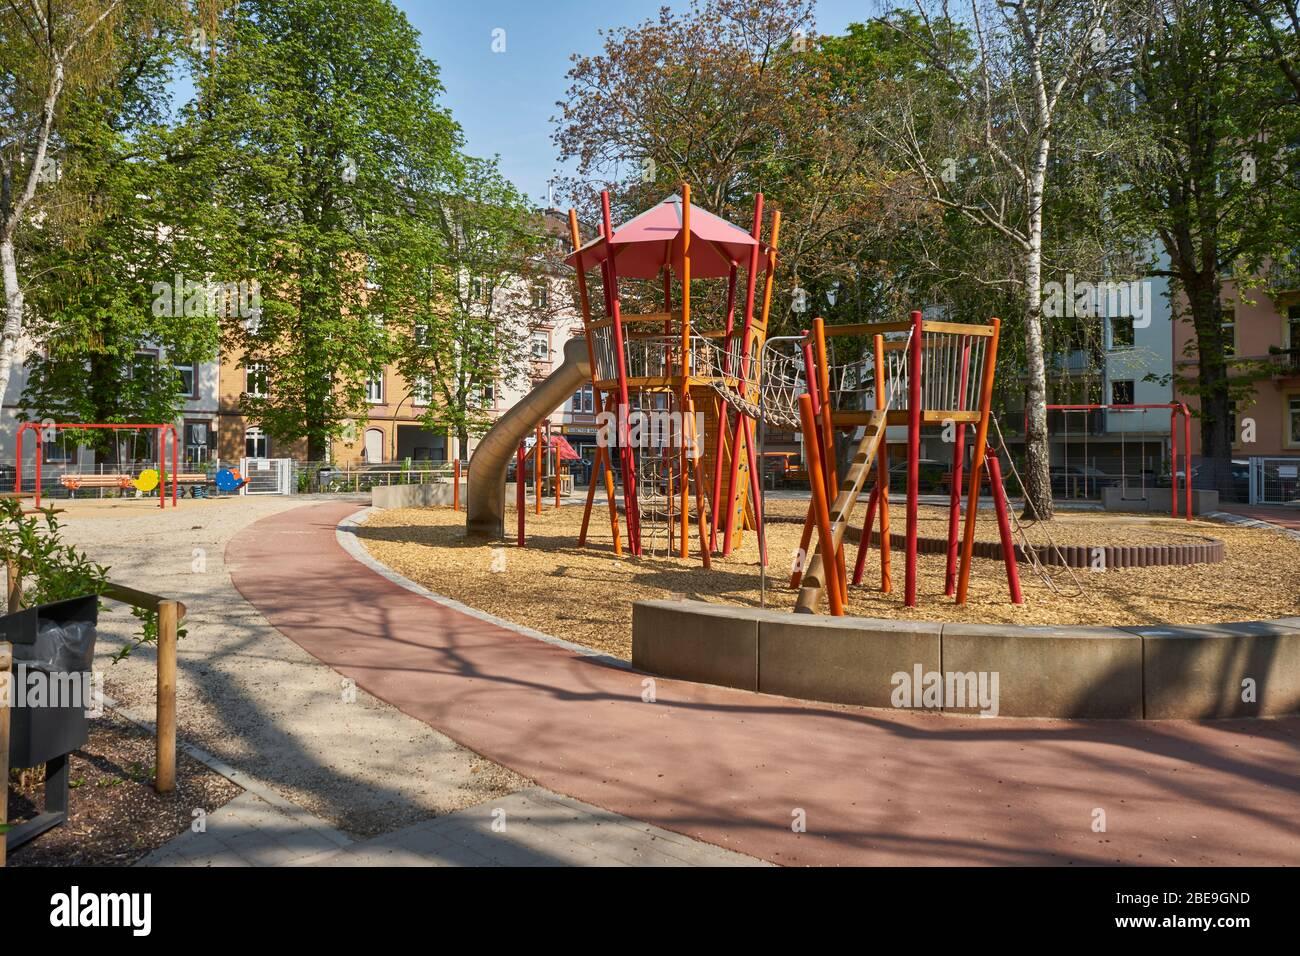 Spielplatz, wegen dem Coronavius geschlossen, Bockenheim, Frankfurt am Main, Deutschland Stock Photo